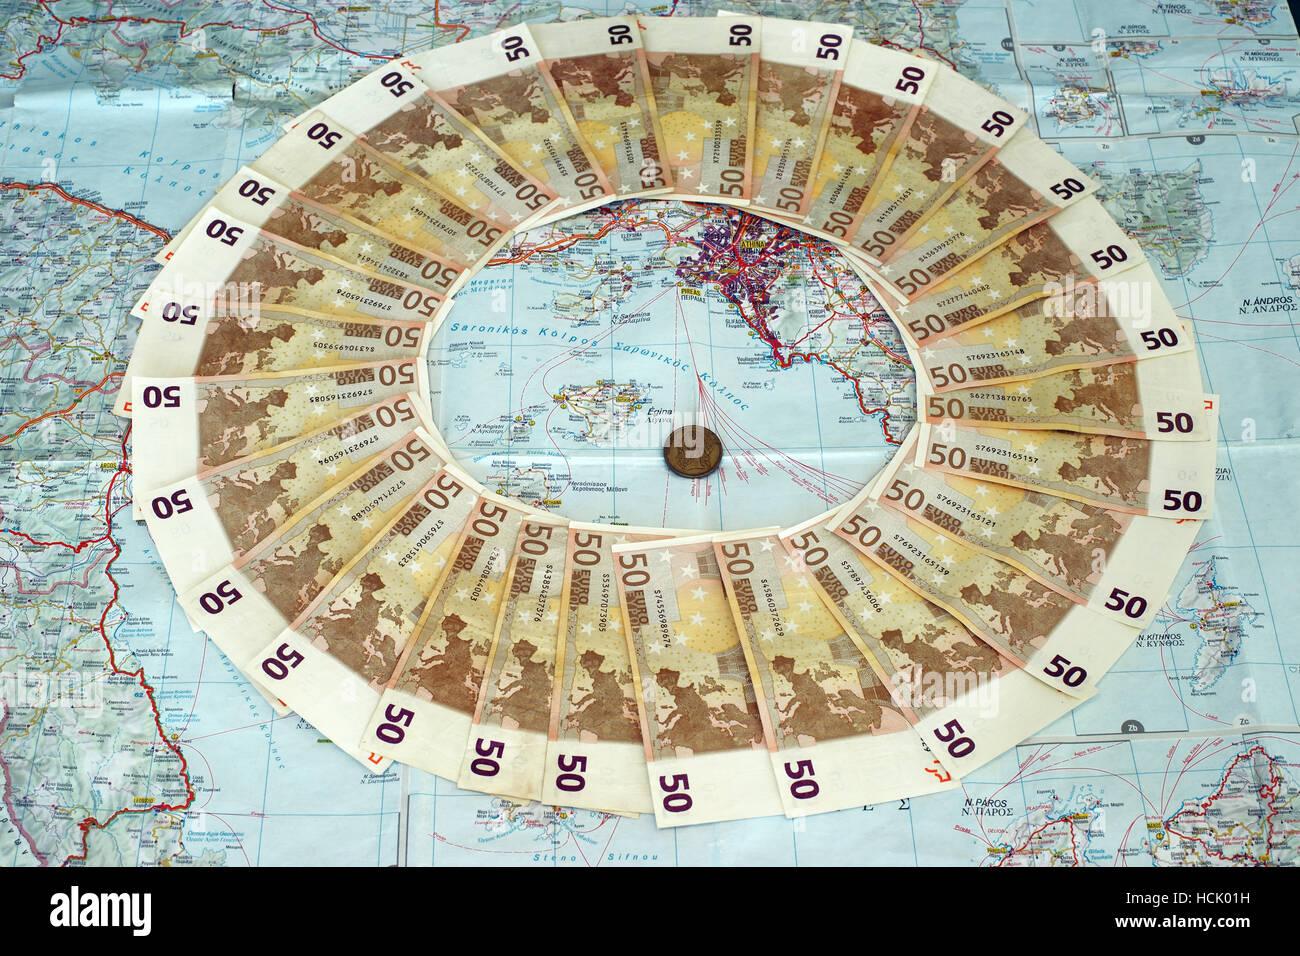 50 euro banknote on map of greece with dracma. Tappeto di banconote da 50 euro. Symbolize greek default Stock Photo